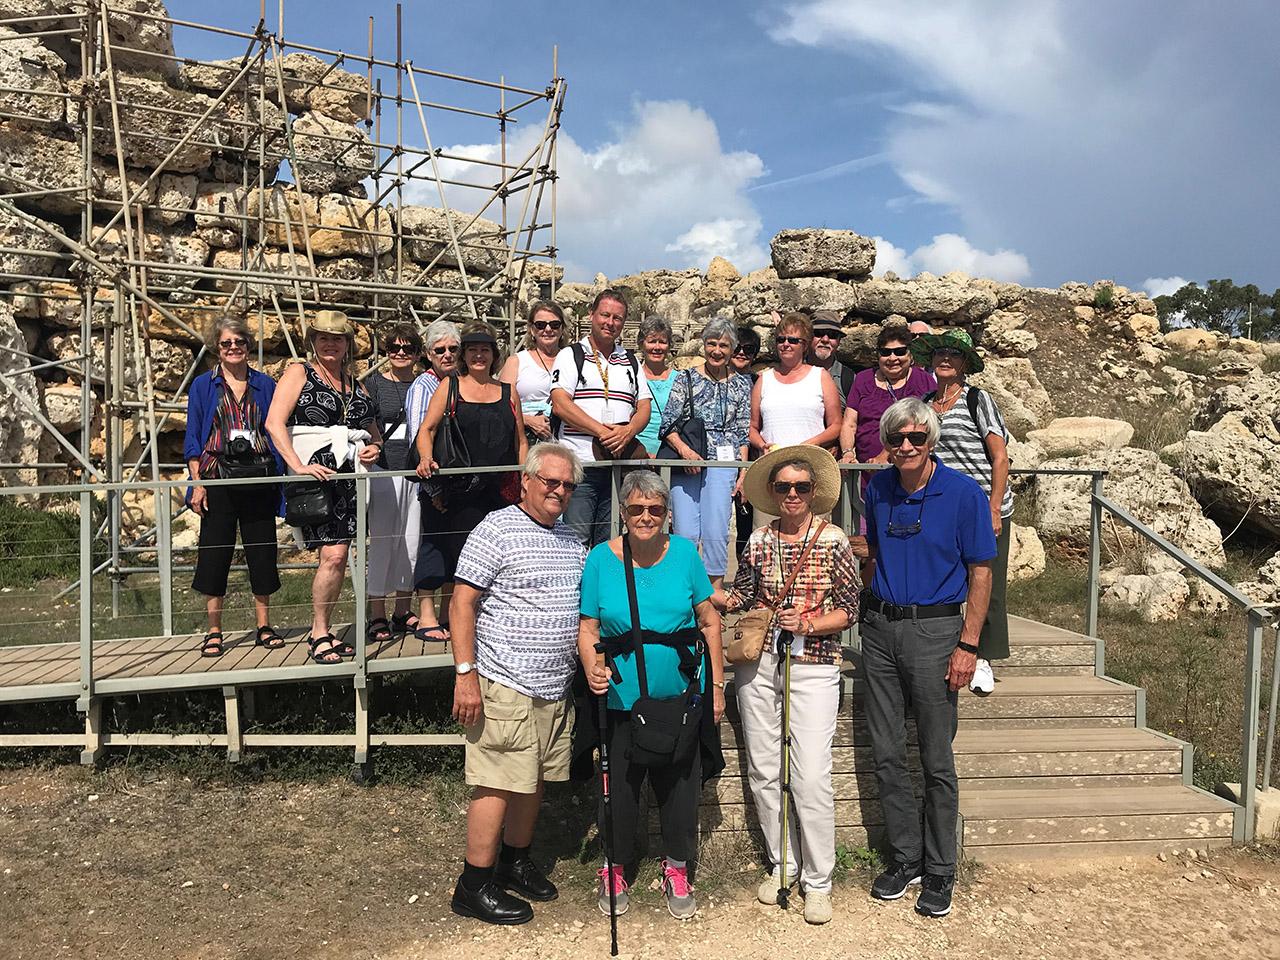 Traveler in group shot